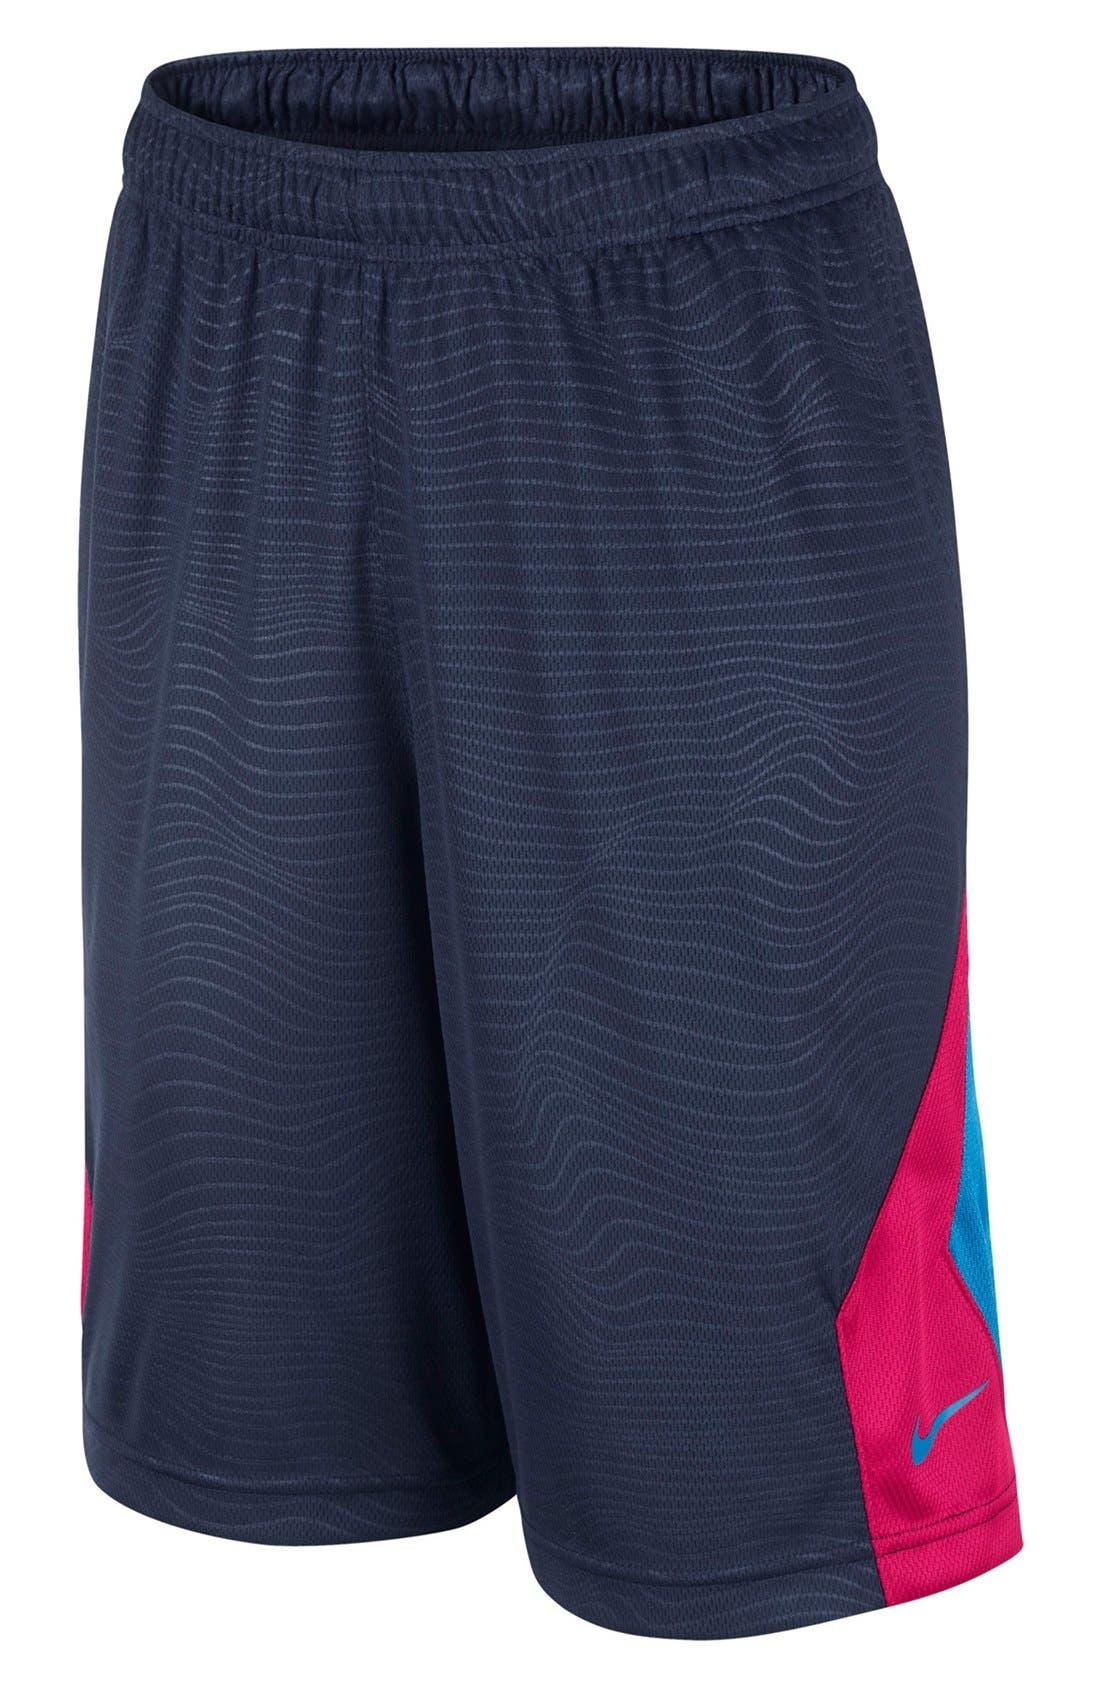 Main Image - Nike 'KD Essential' Dri-FIT Basketball Shorts (Big Boys)